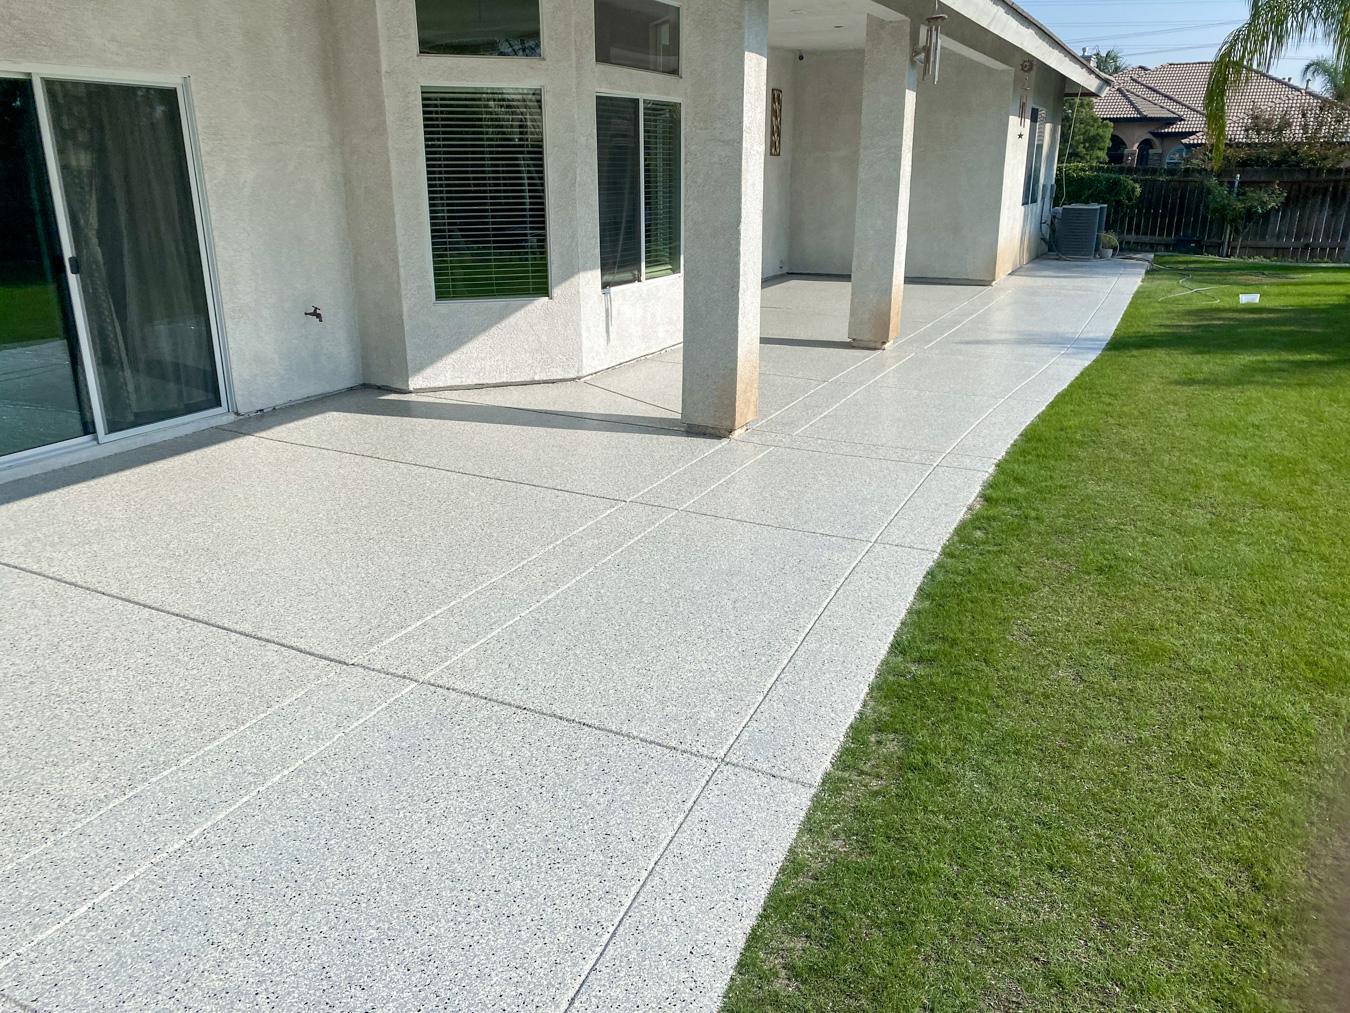 Patio with gray concrete coating